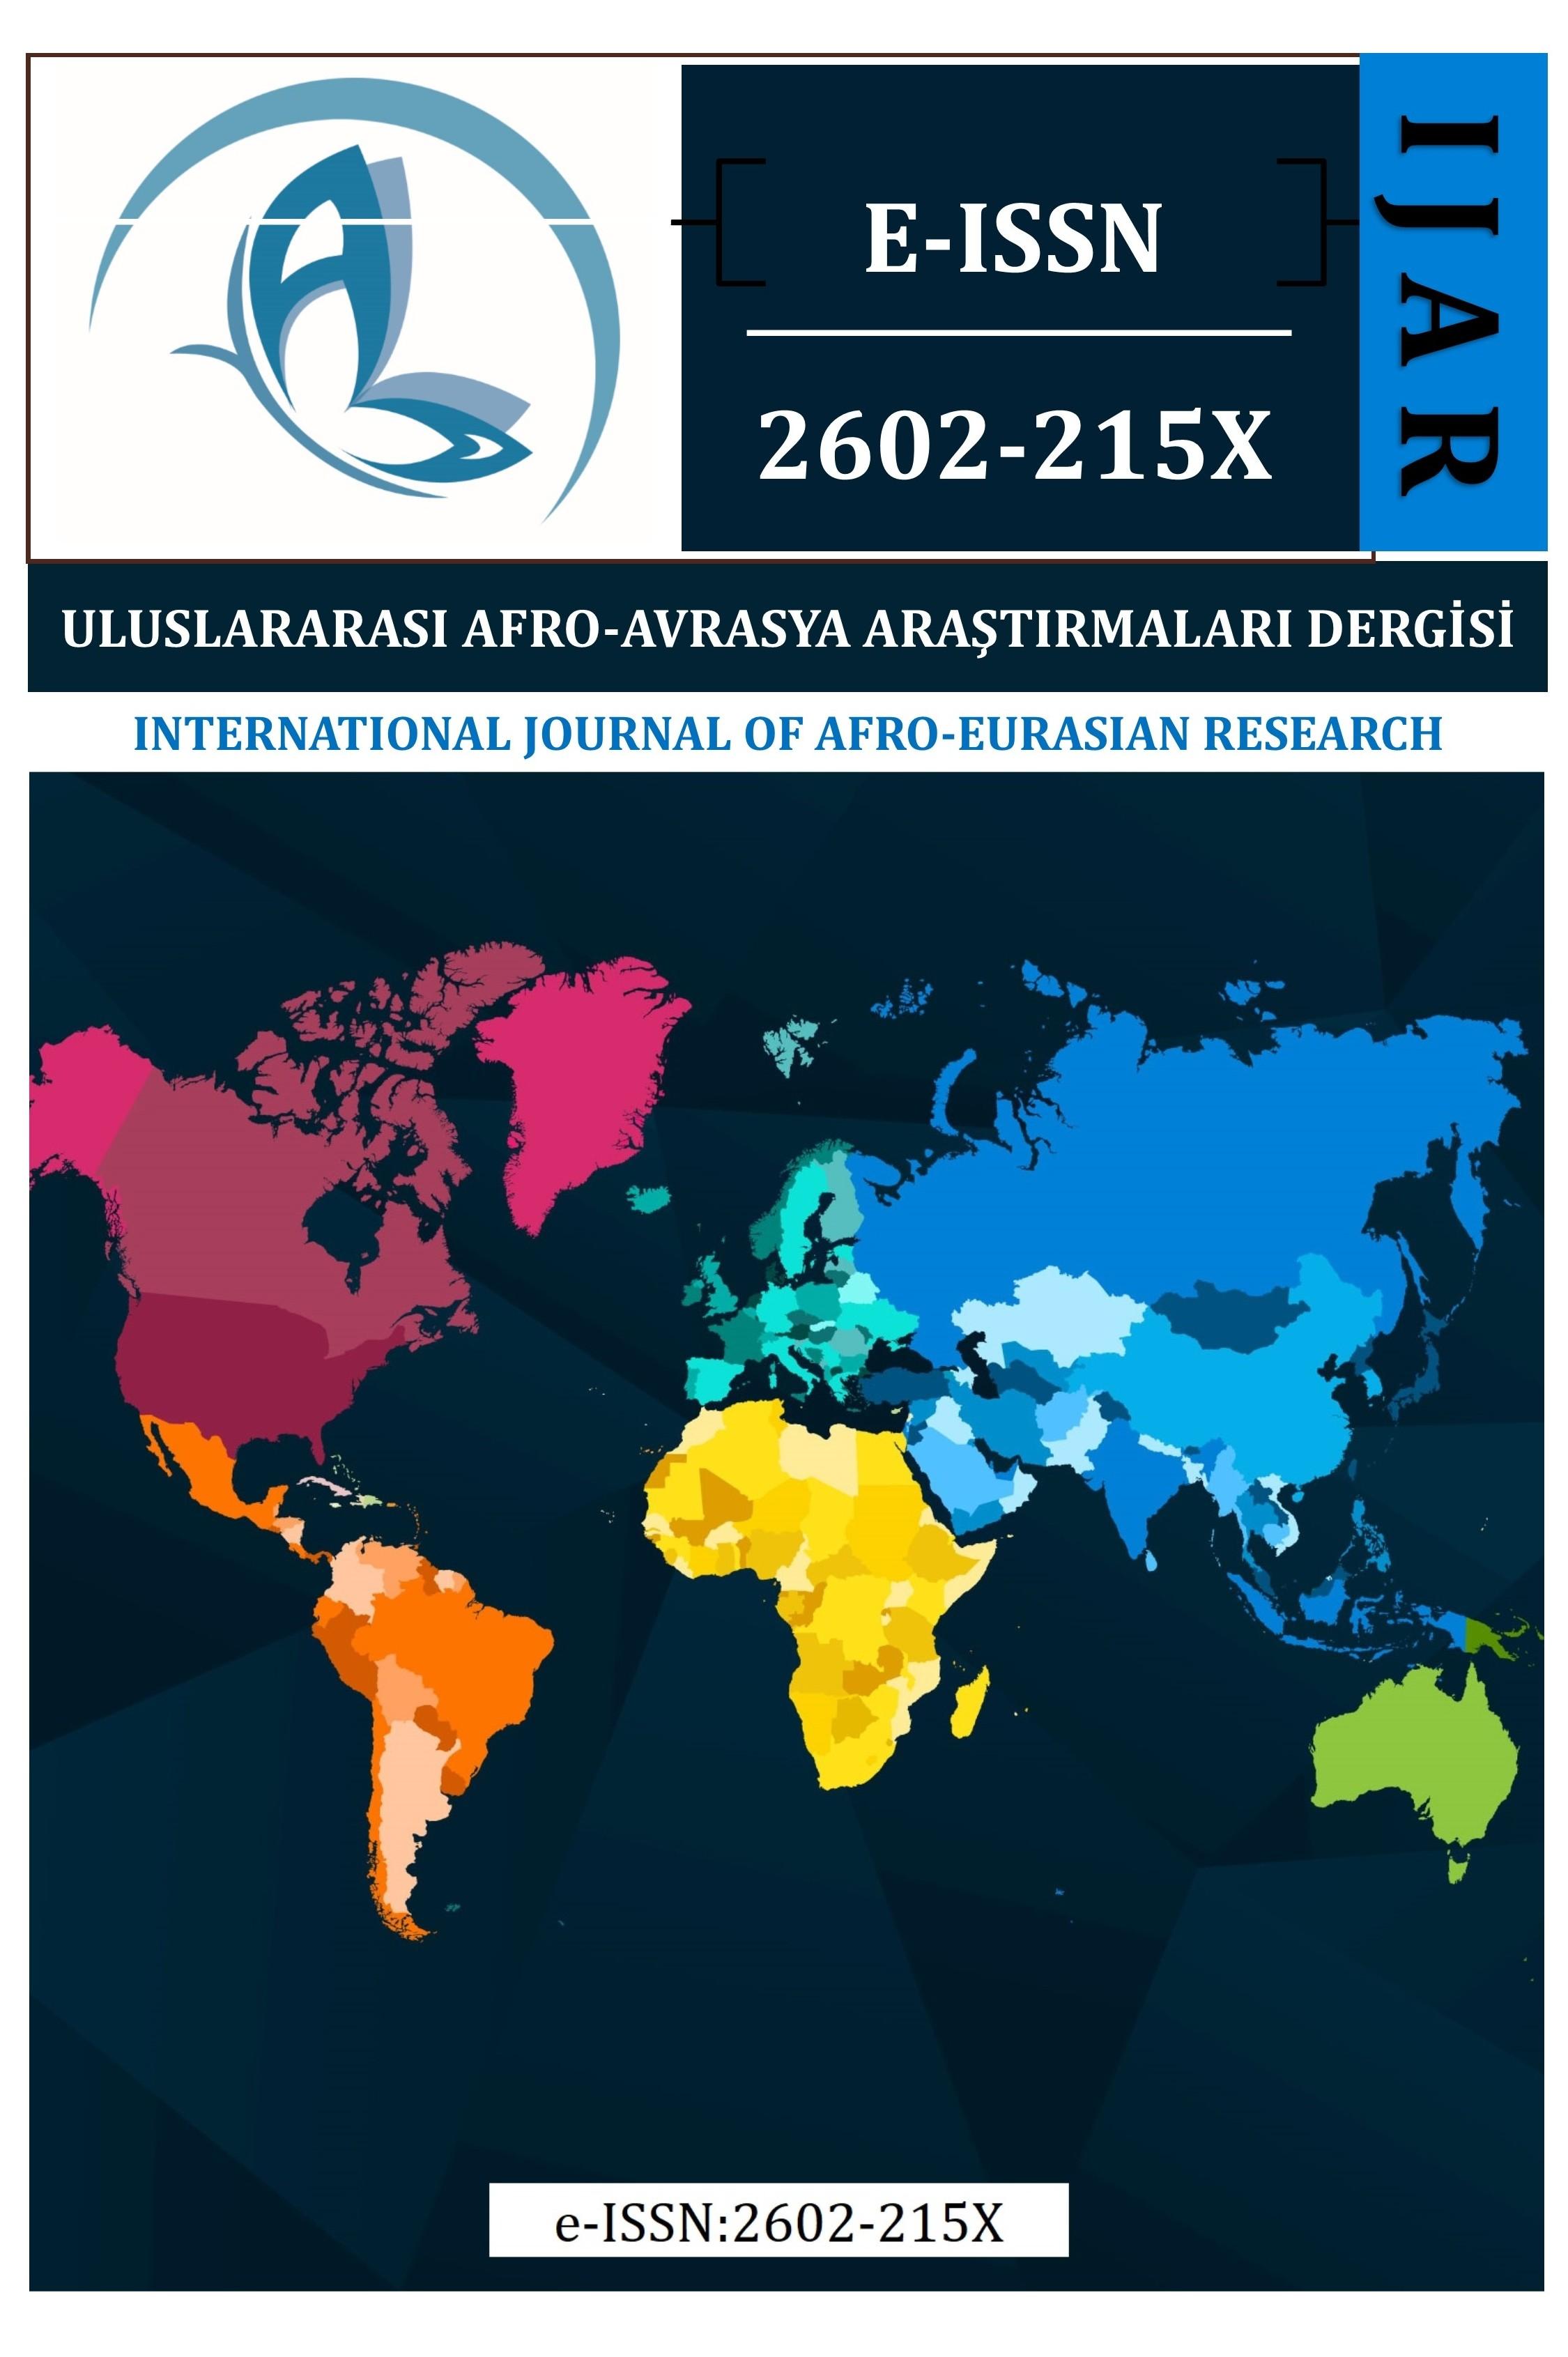 International Journal of Afro-Eurasian Research